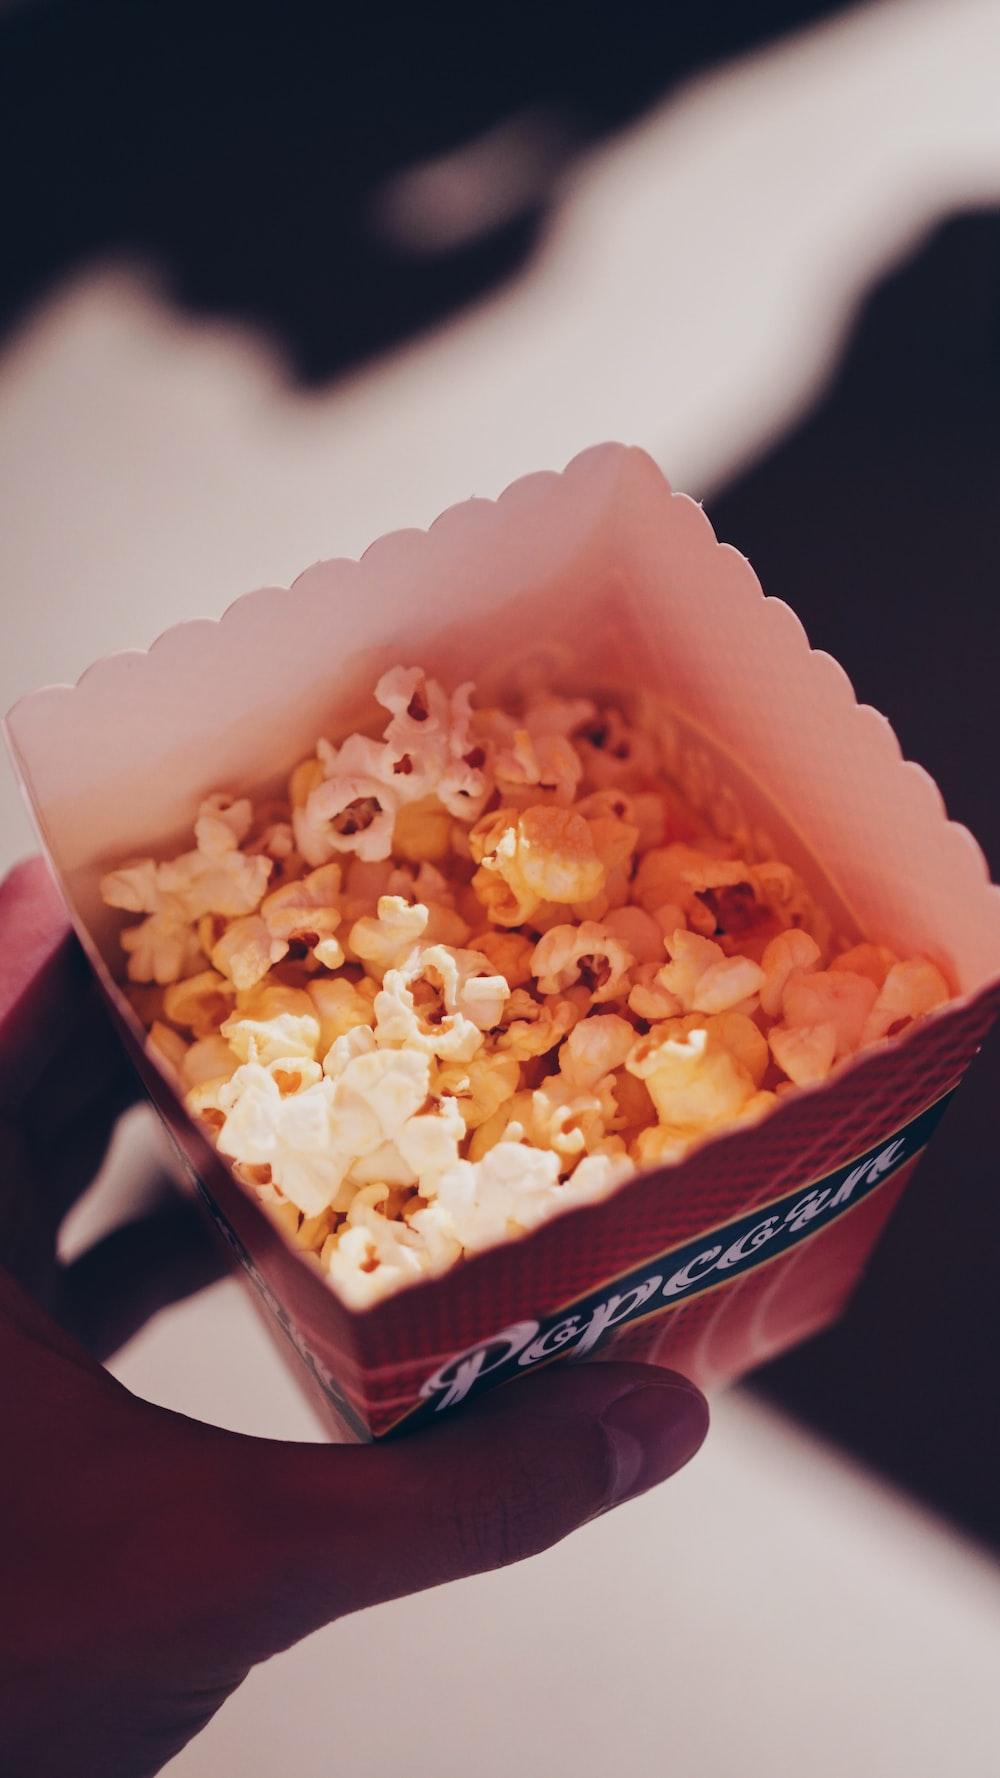 person holding popcorn in box